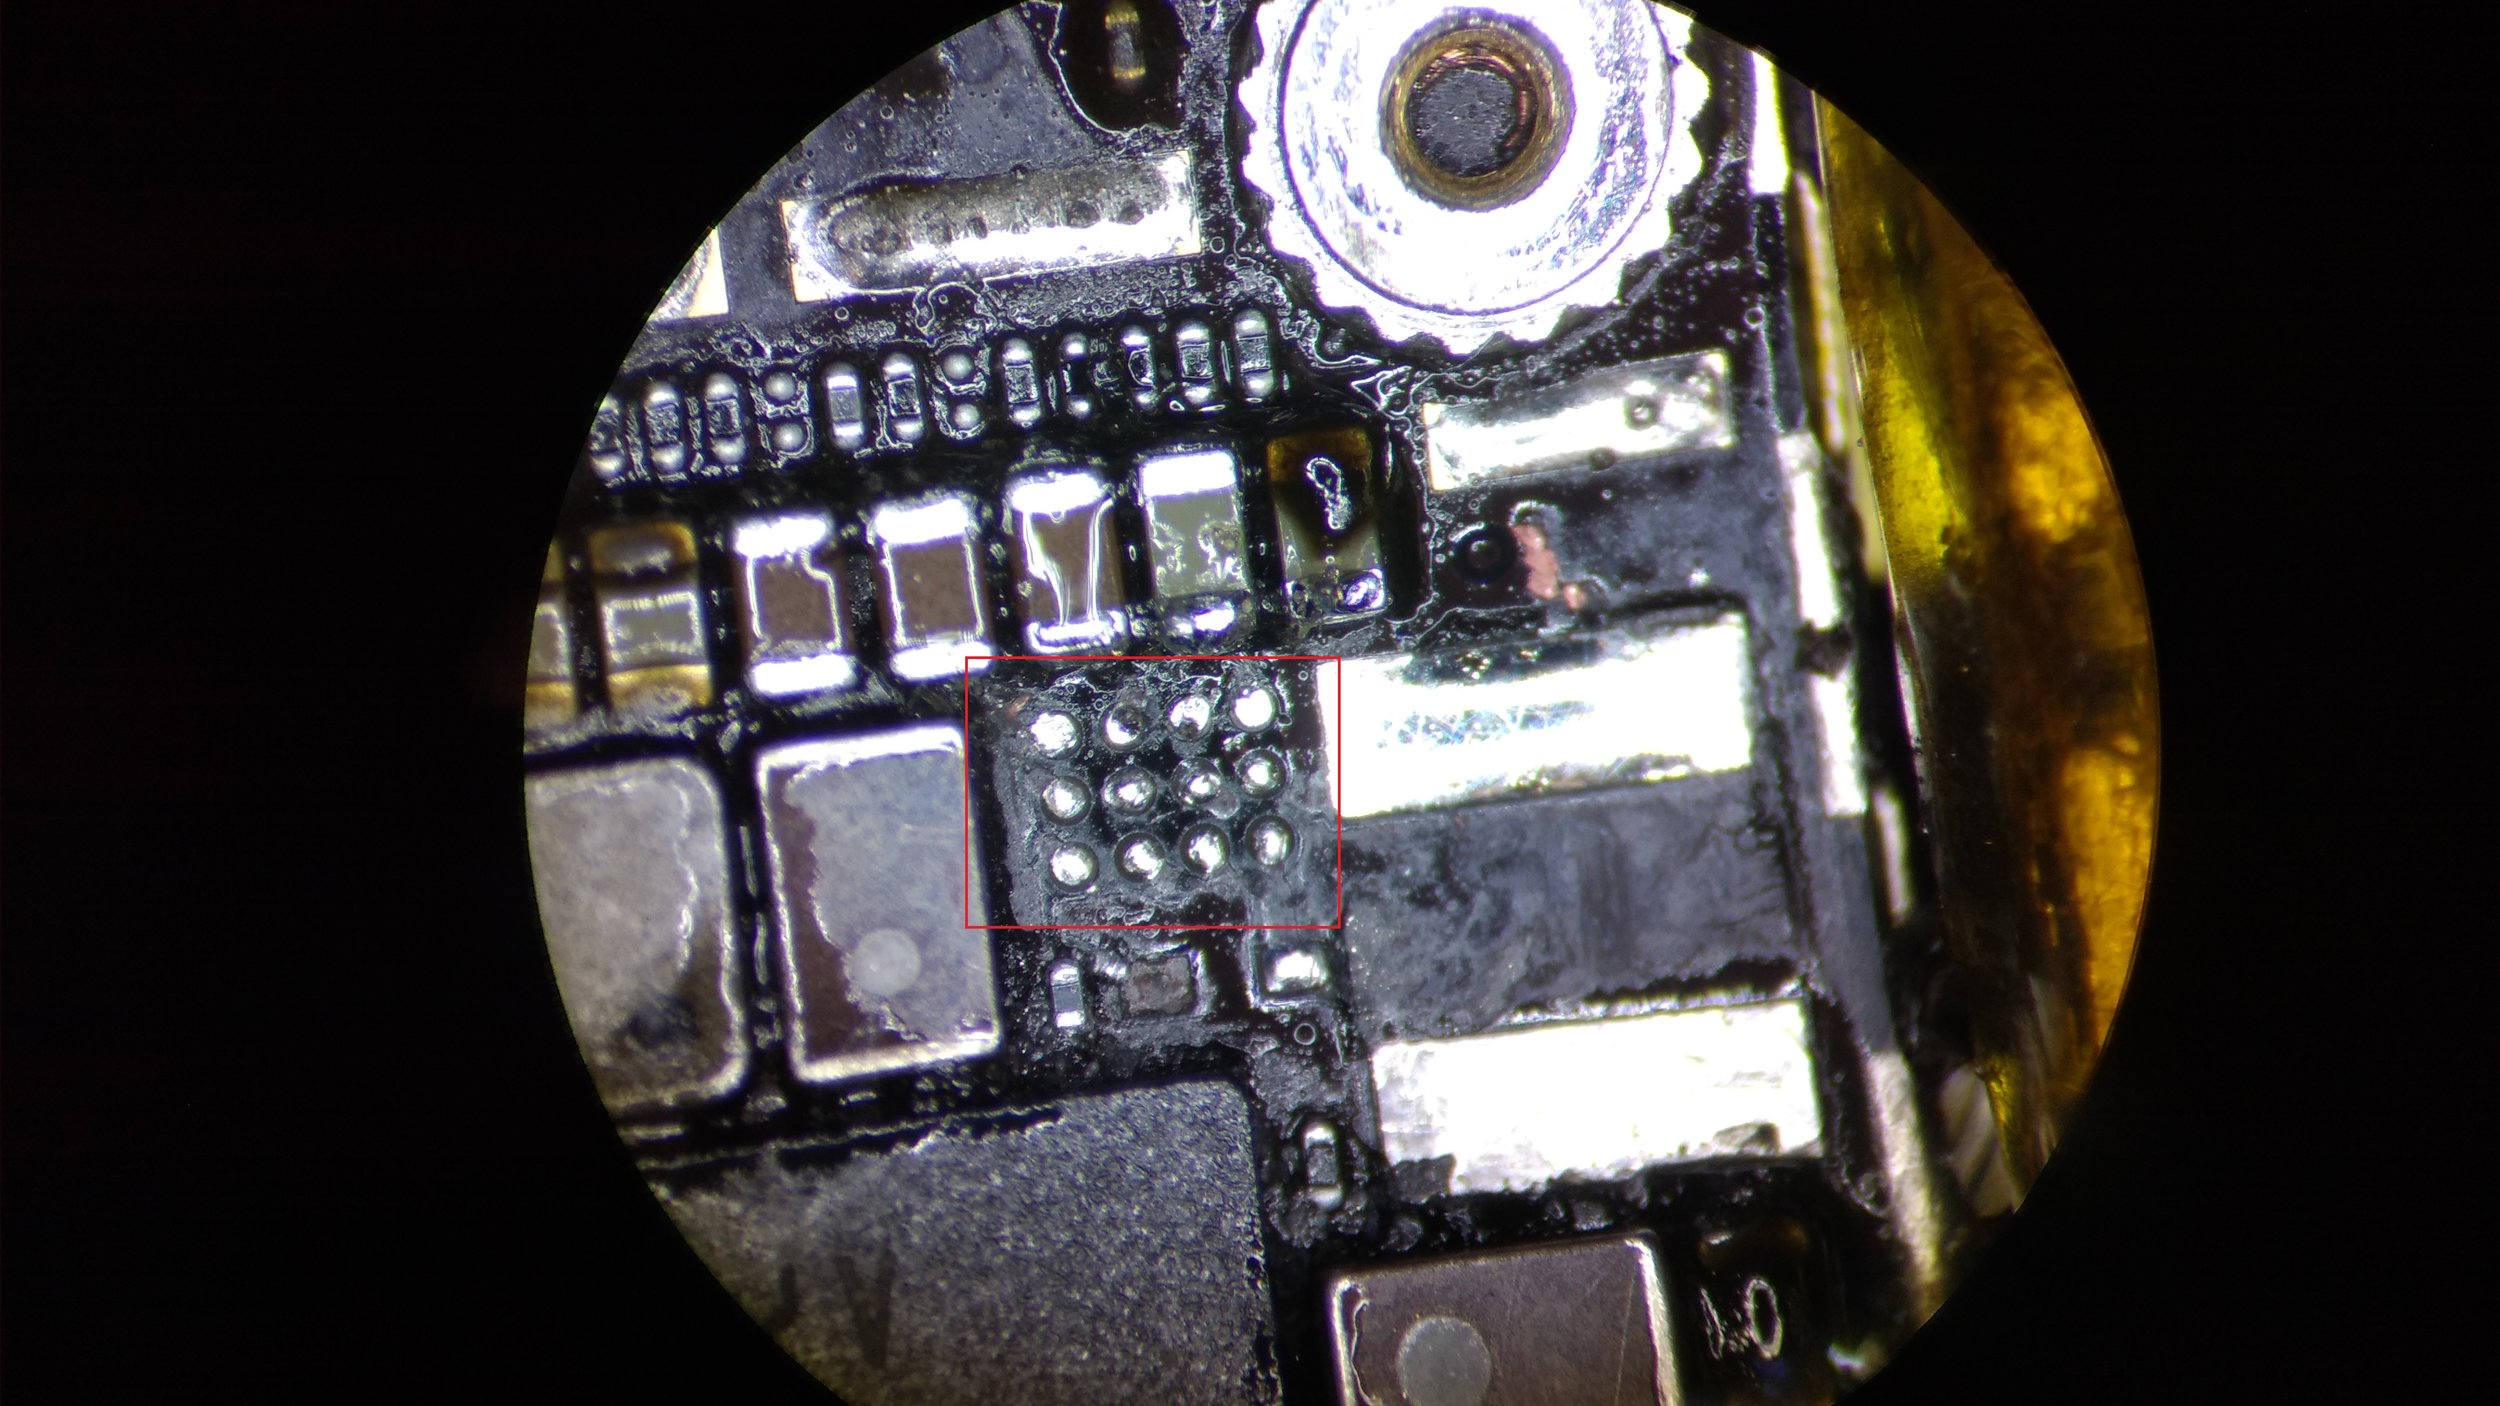 Backlight display driver IC U1502 - Removed